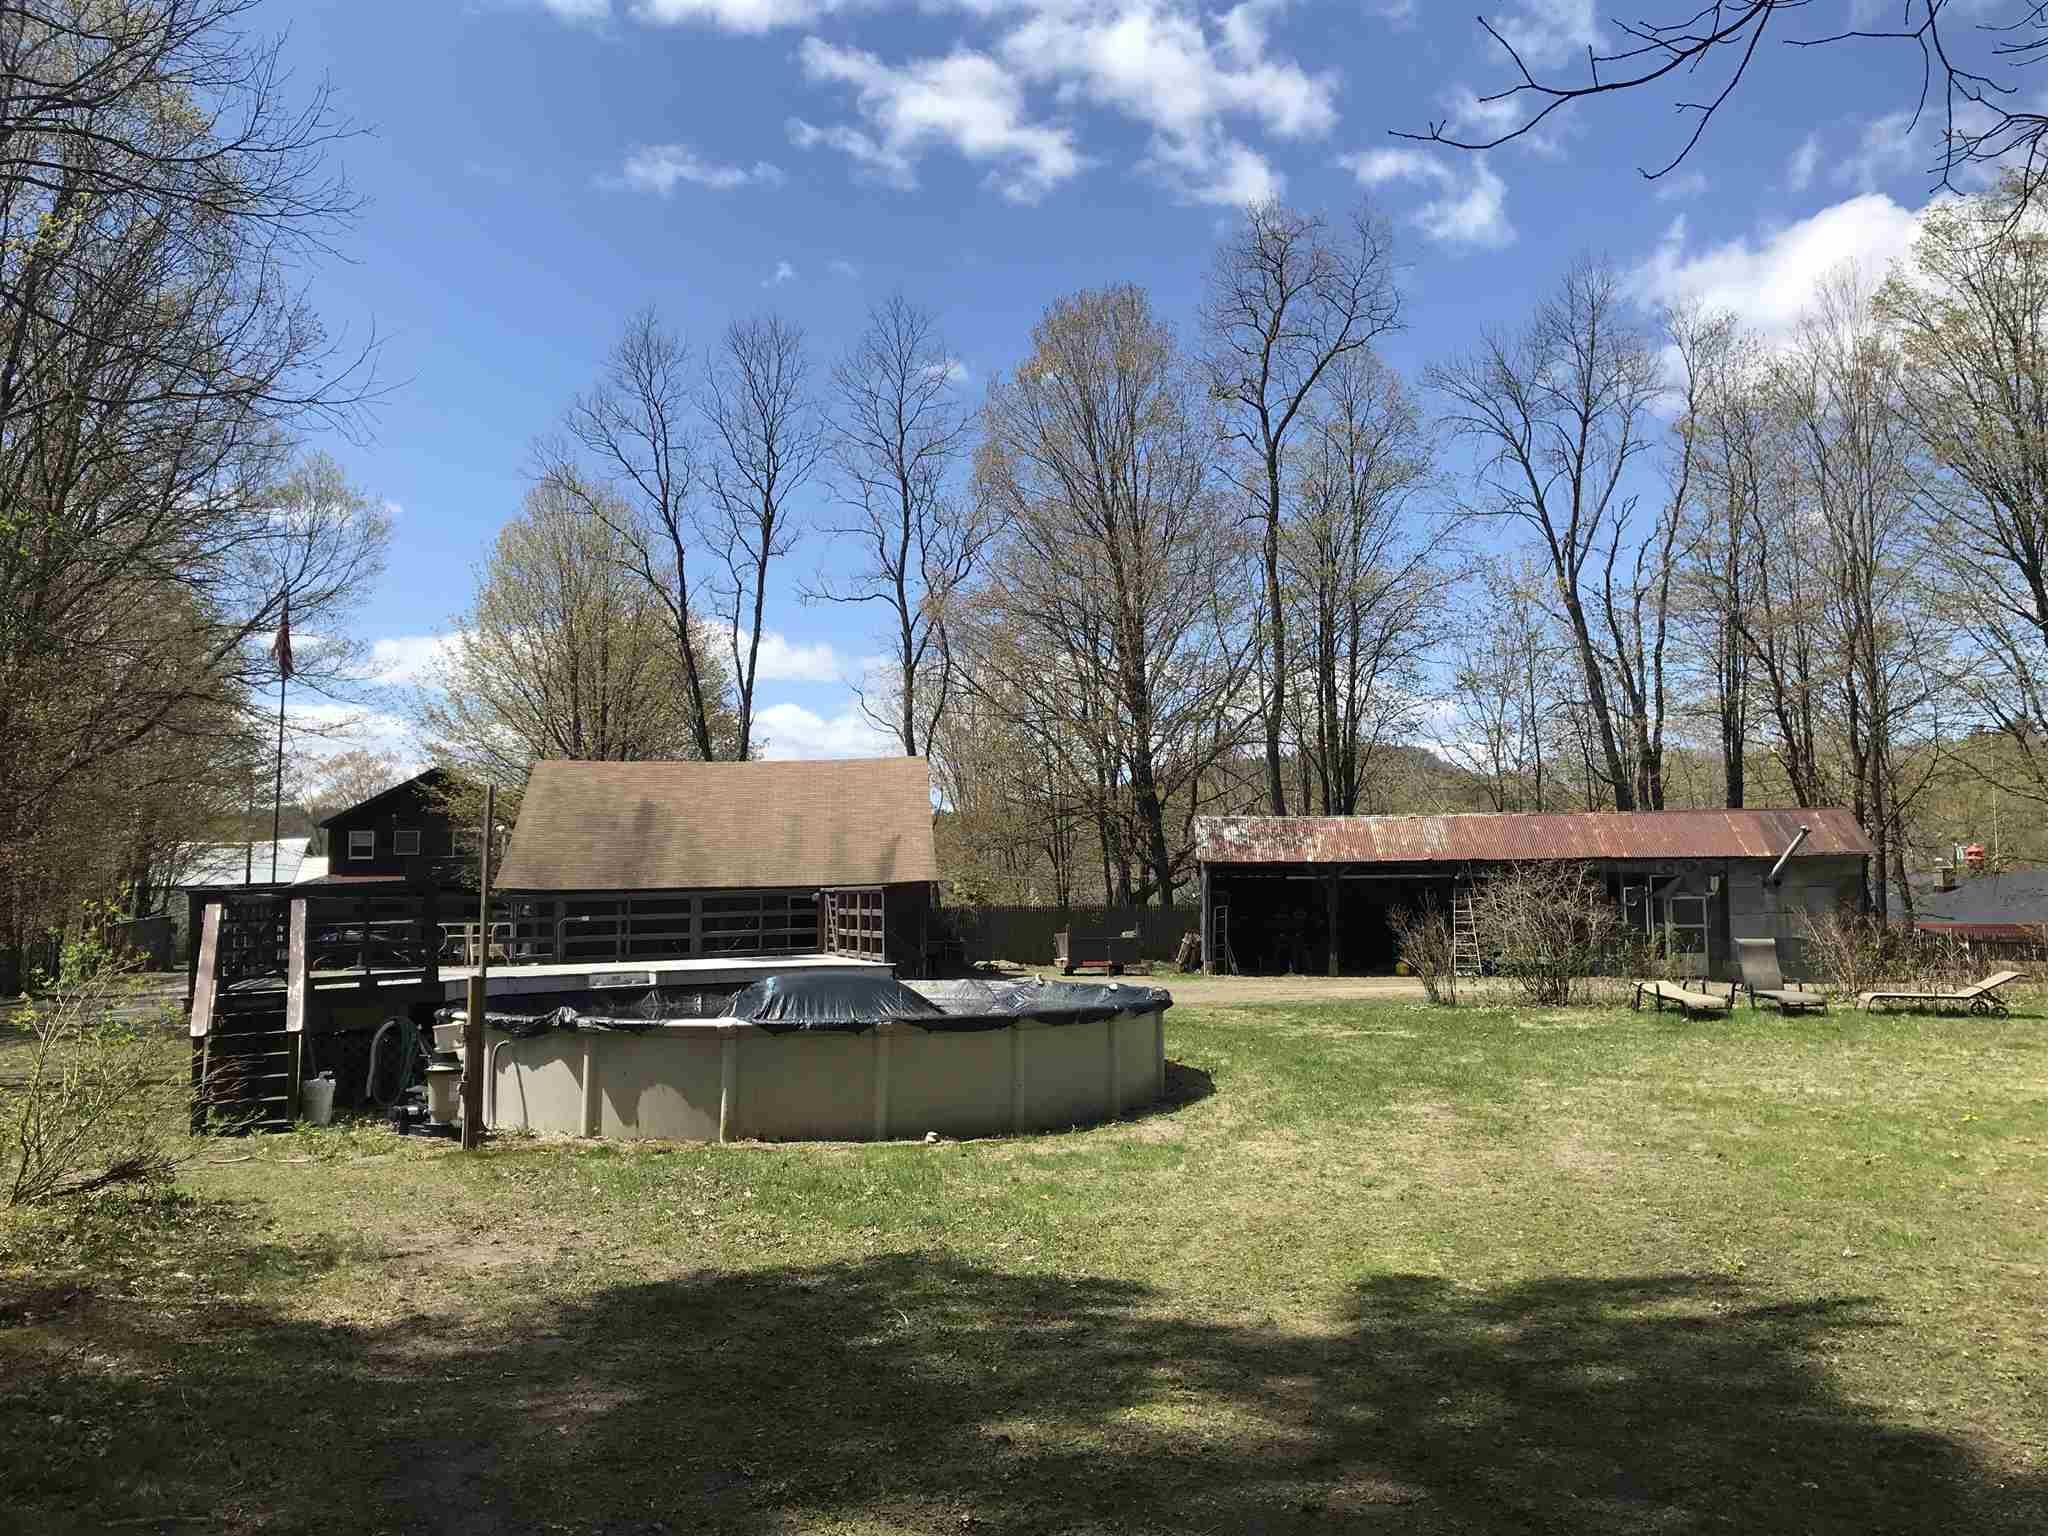 VILLAGE OF NORTH WALPOLE IN TOWN OF ALSTEAD NHMulti Family for sale $$244,000 | $88 per sq.ft.